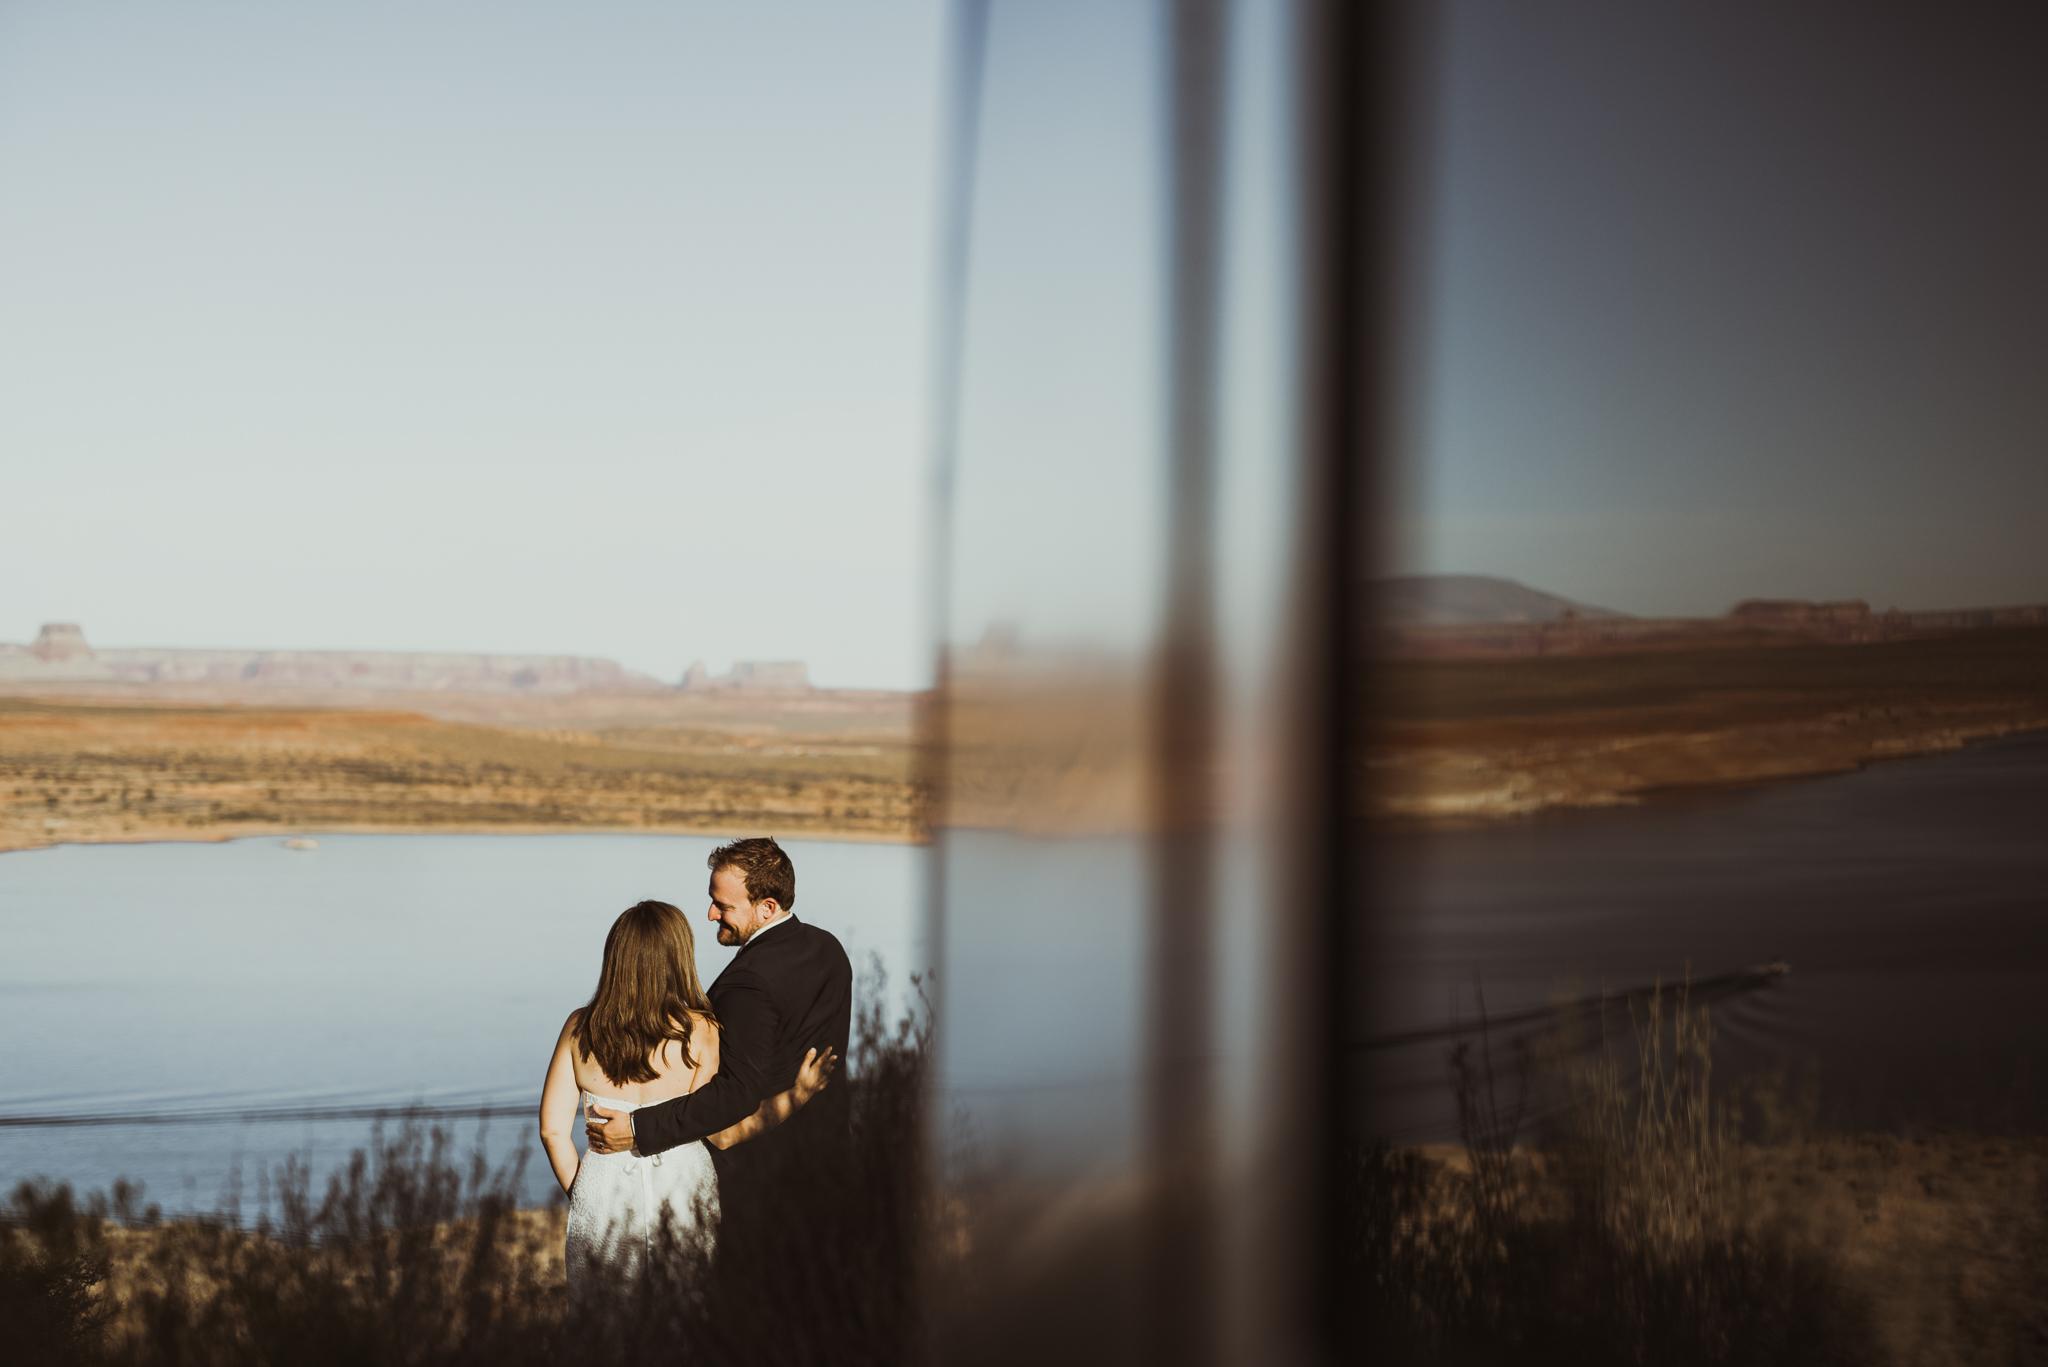 ©Isaiah + Taylor Photography - Lake Powell Elopement & Antelope Canyon & Horseshoe Bend, Page, Arizona-56.jpg